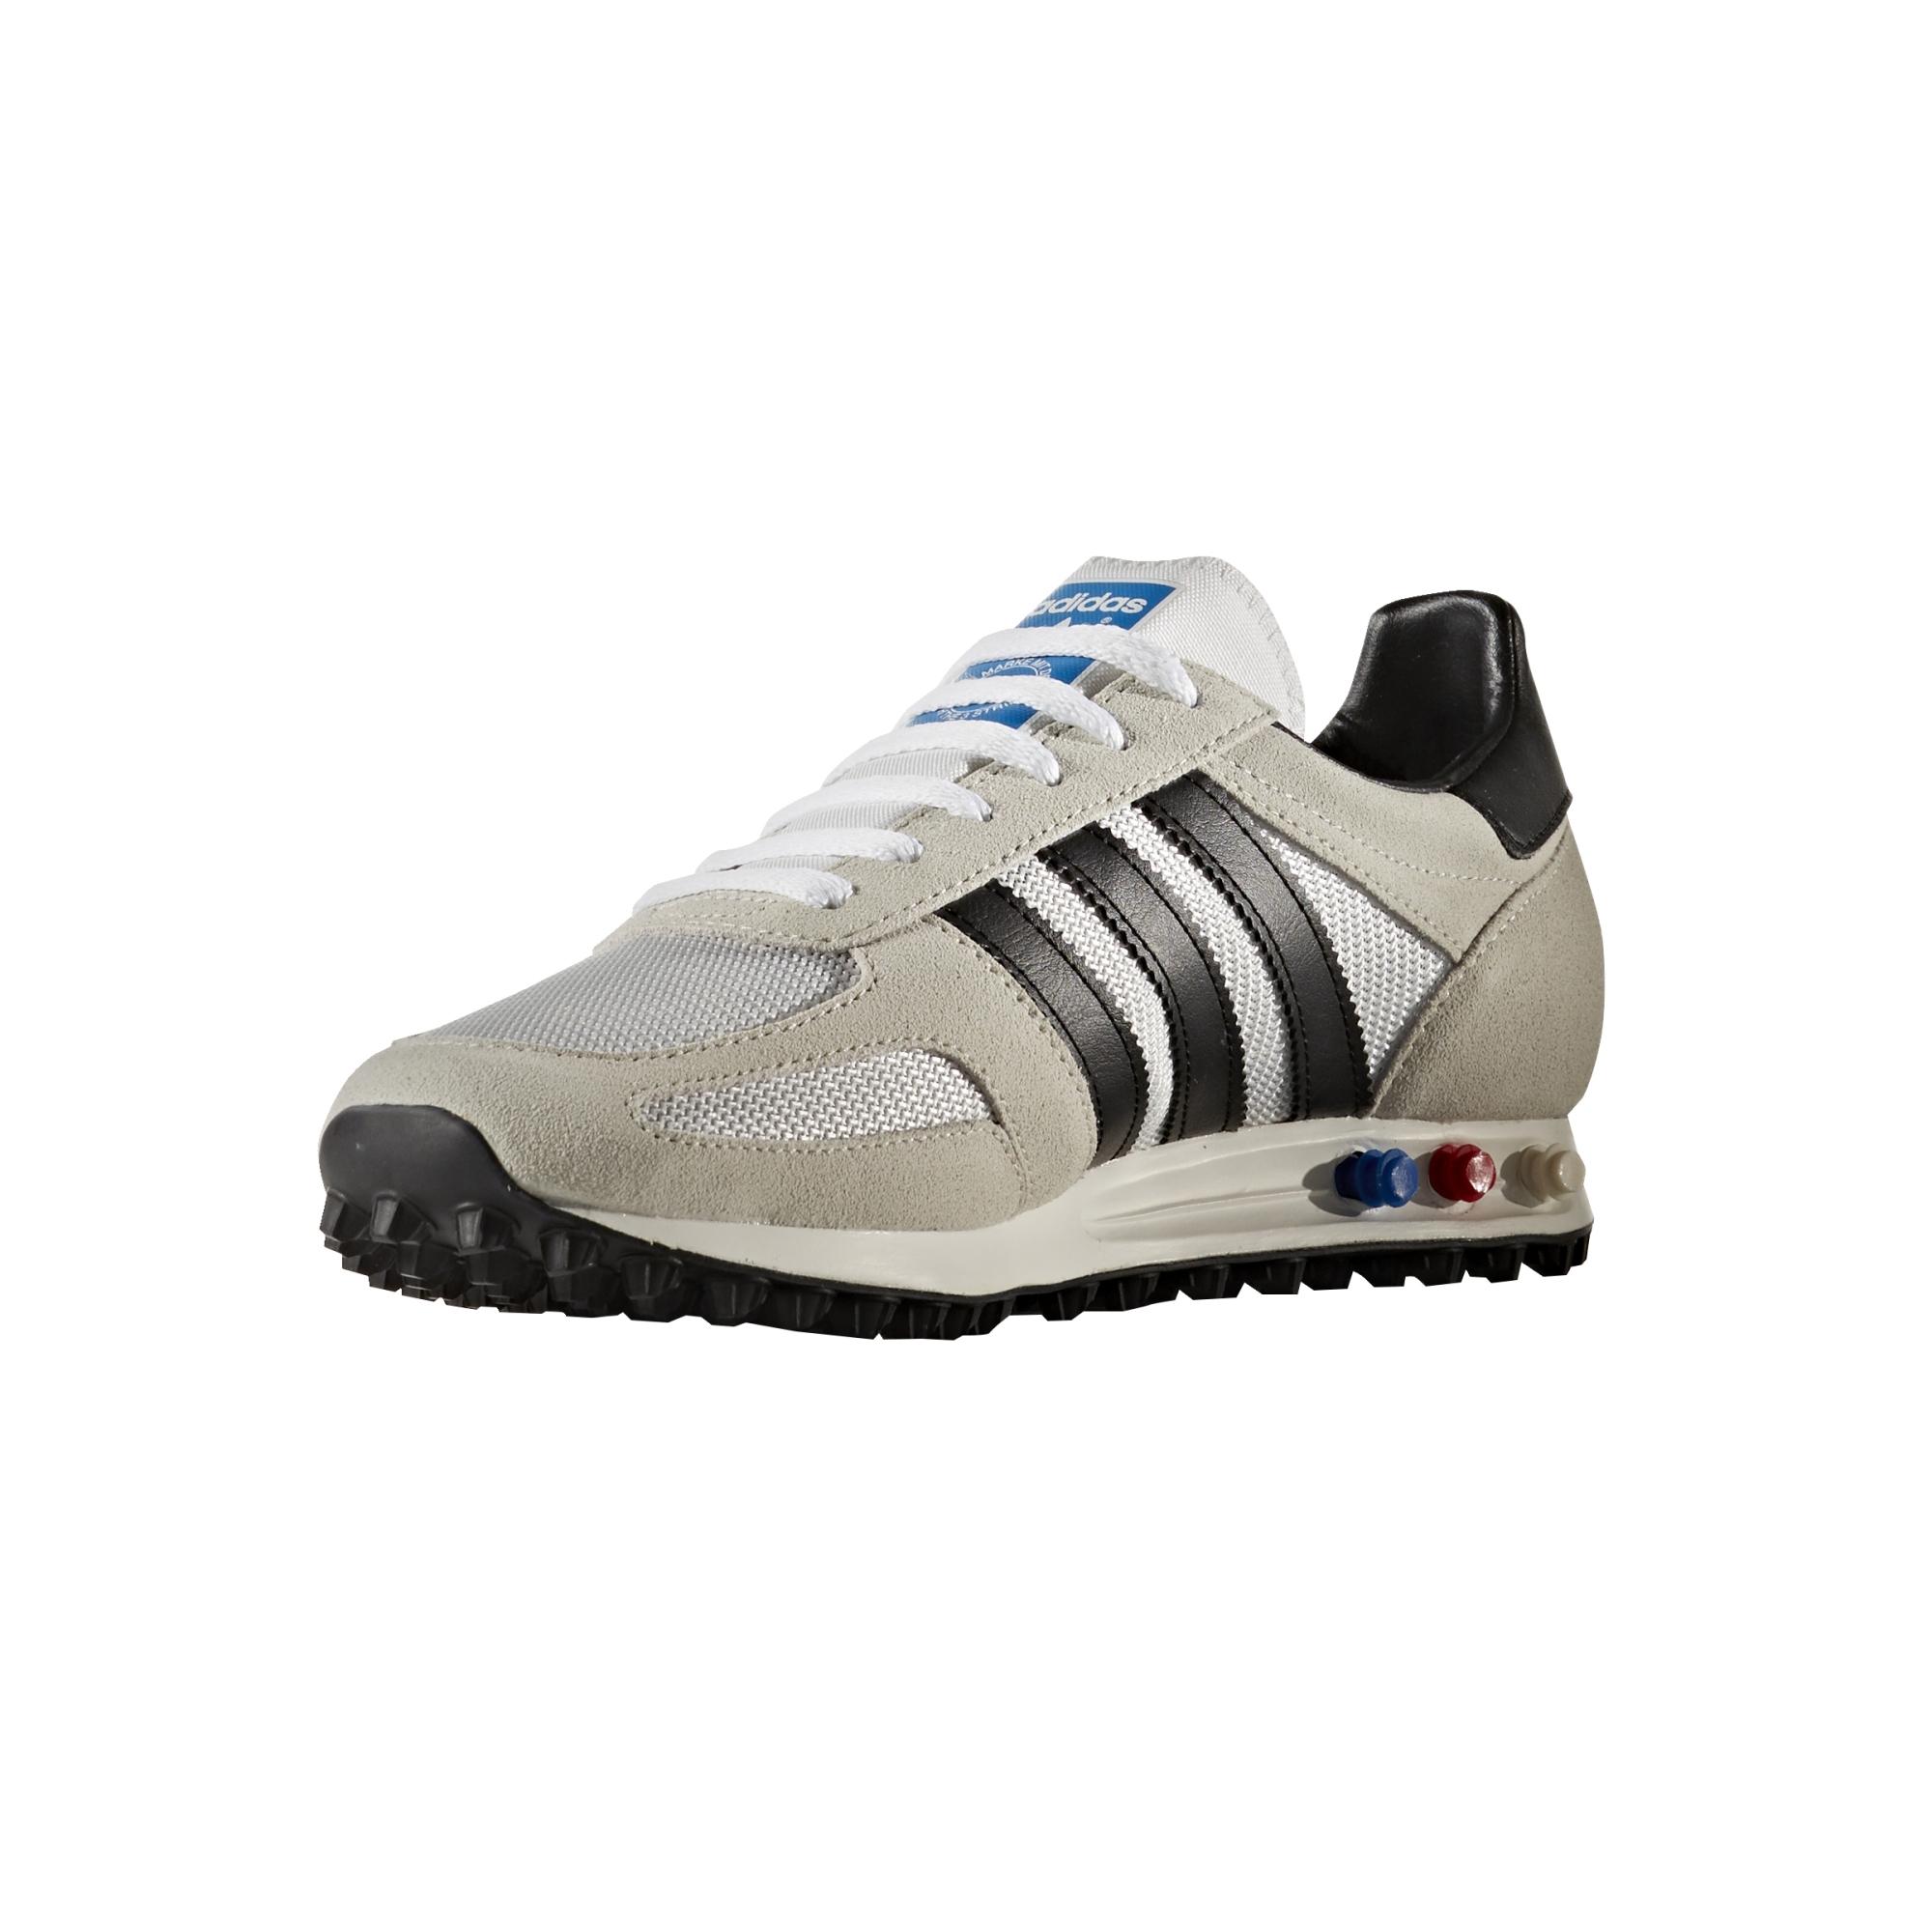 Adidas Originals LA Trainer OG (vintage whitecore blackclear b